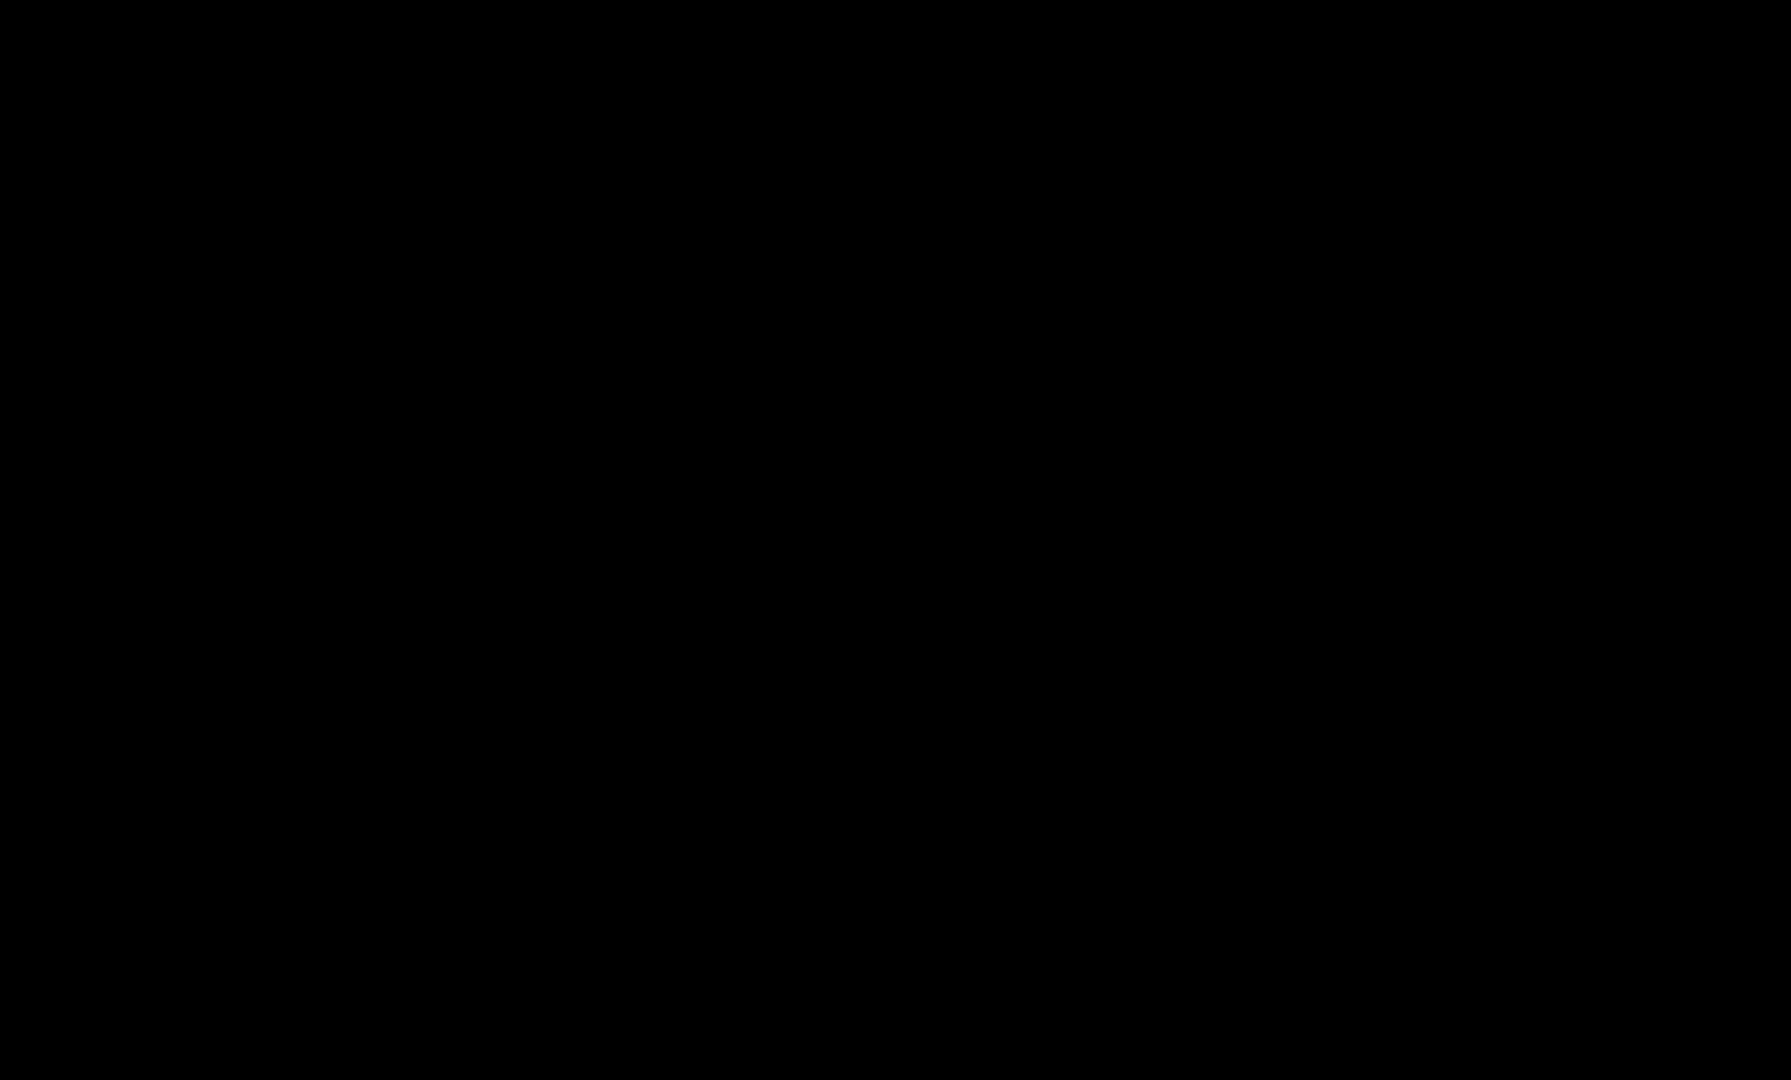 OfficialLogo-WildFit-BlackonAlpha-3000x1809